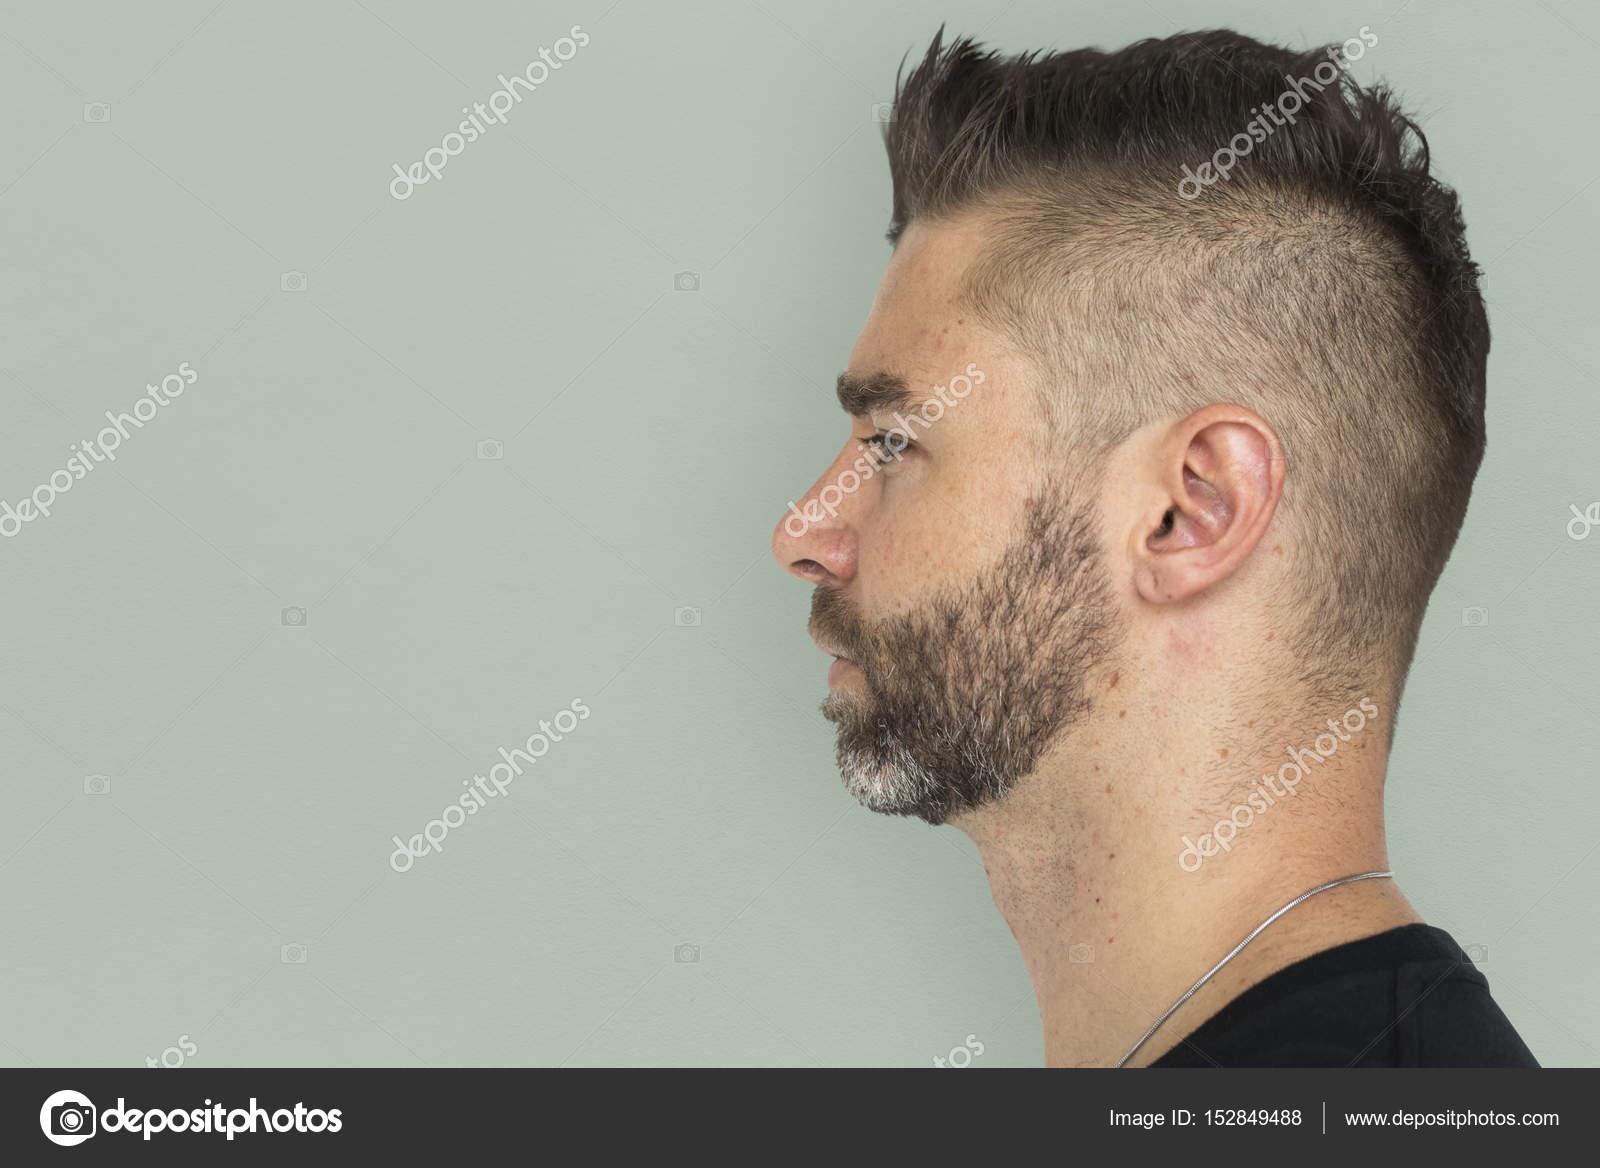 Homme Avec Une Coiffure Elegante Et Barbe Photographie Rawpixel